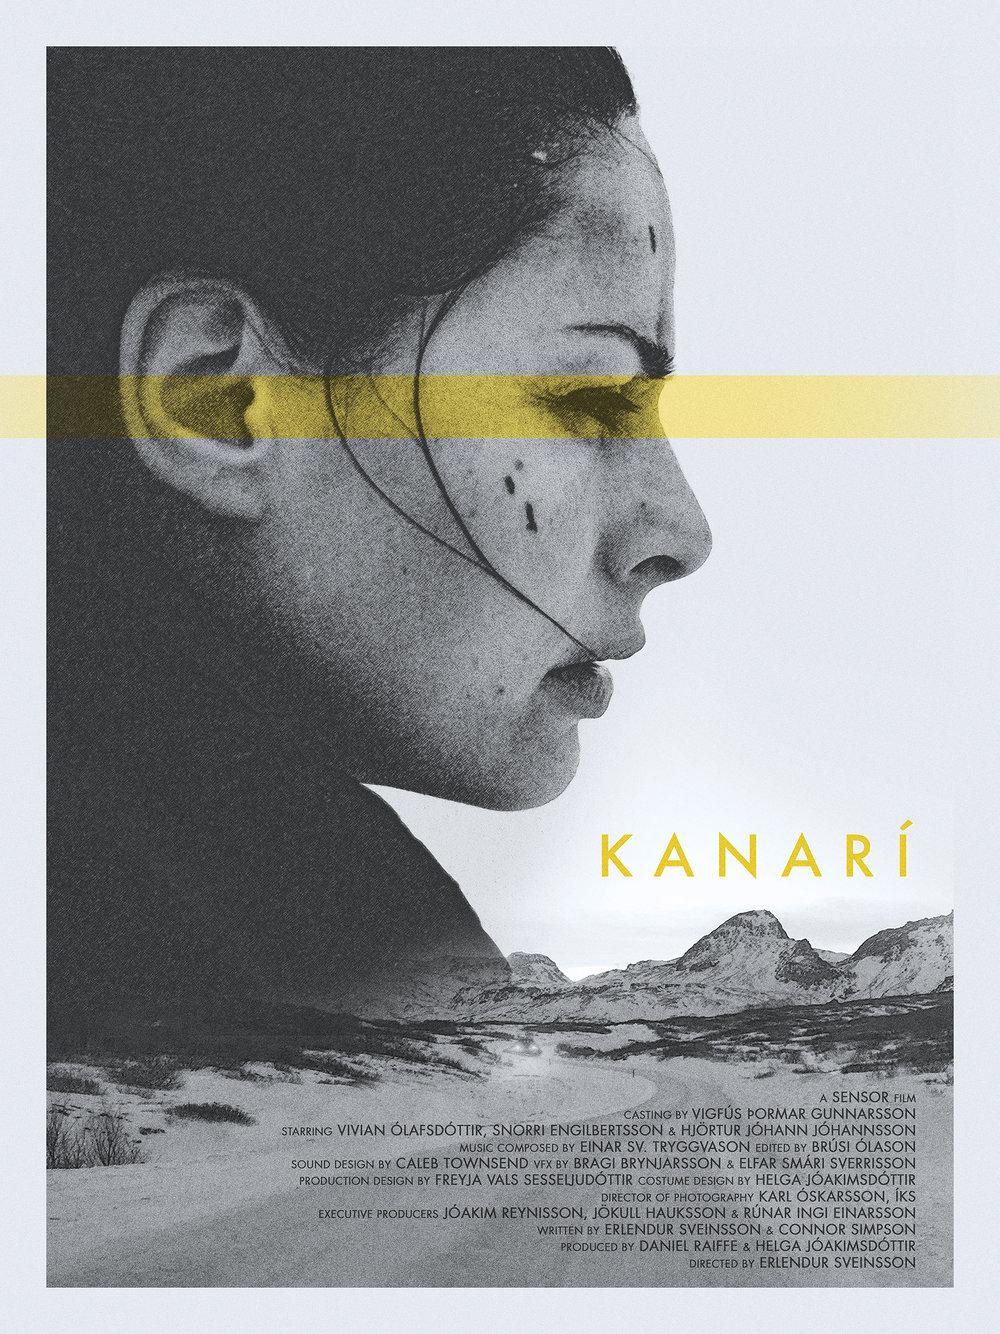 kanari_poster_thumb.jpg